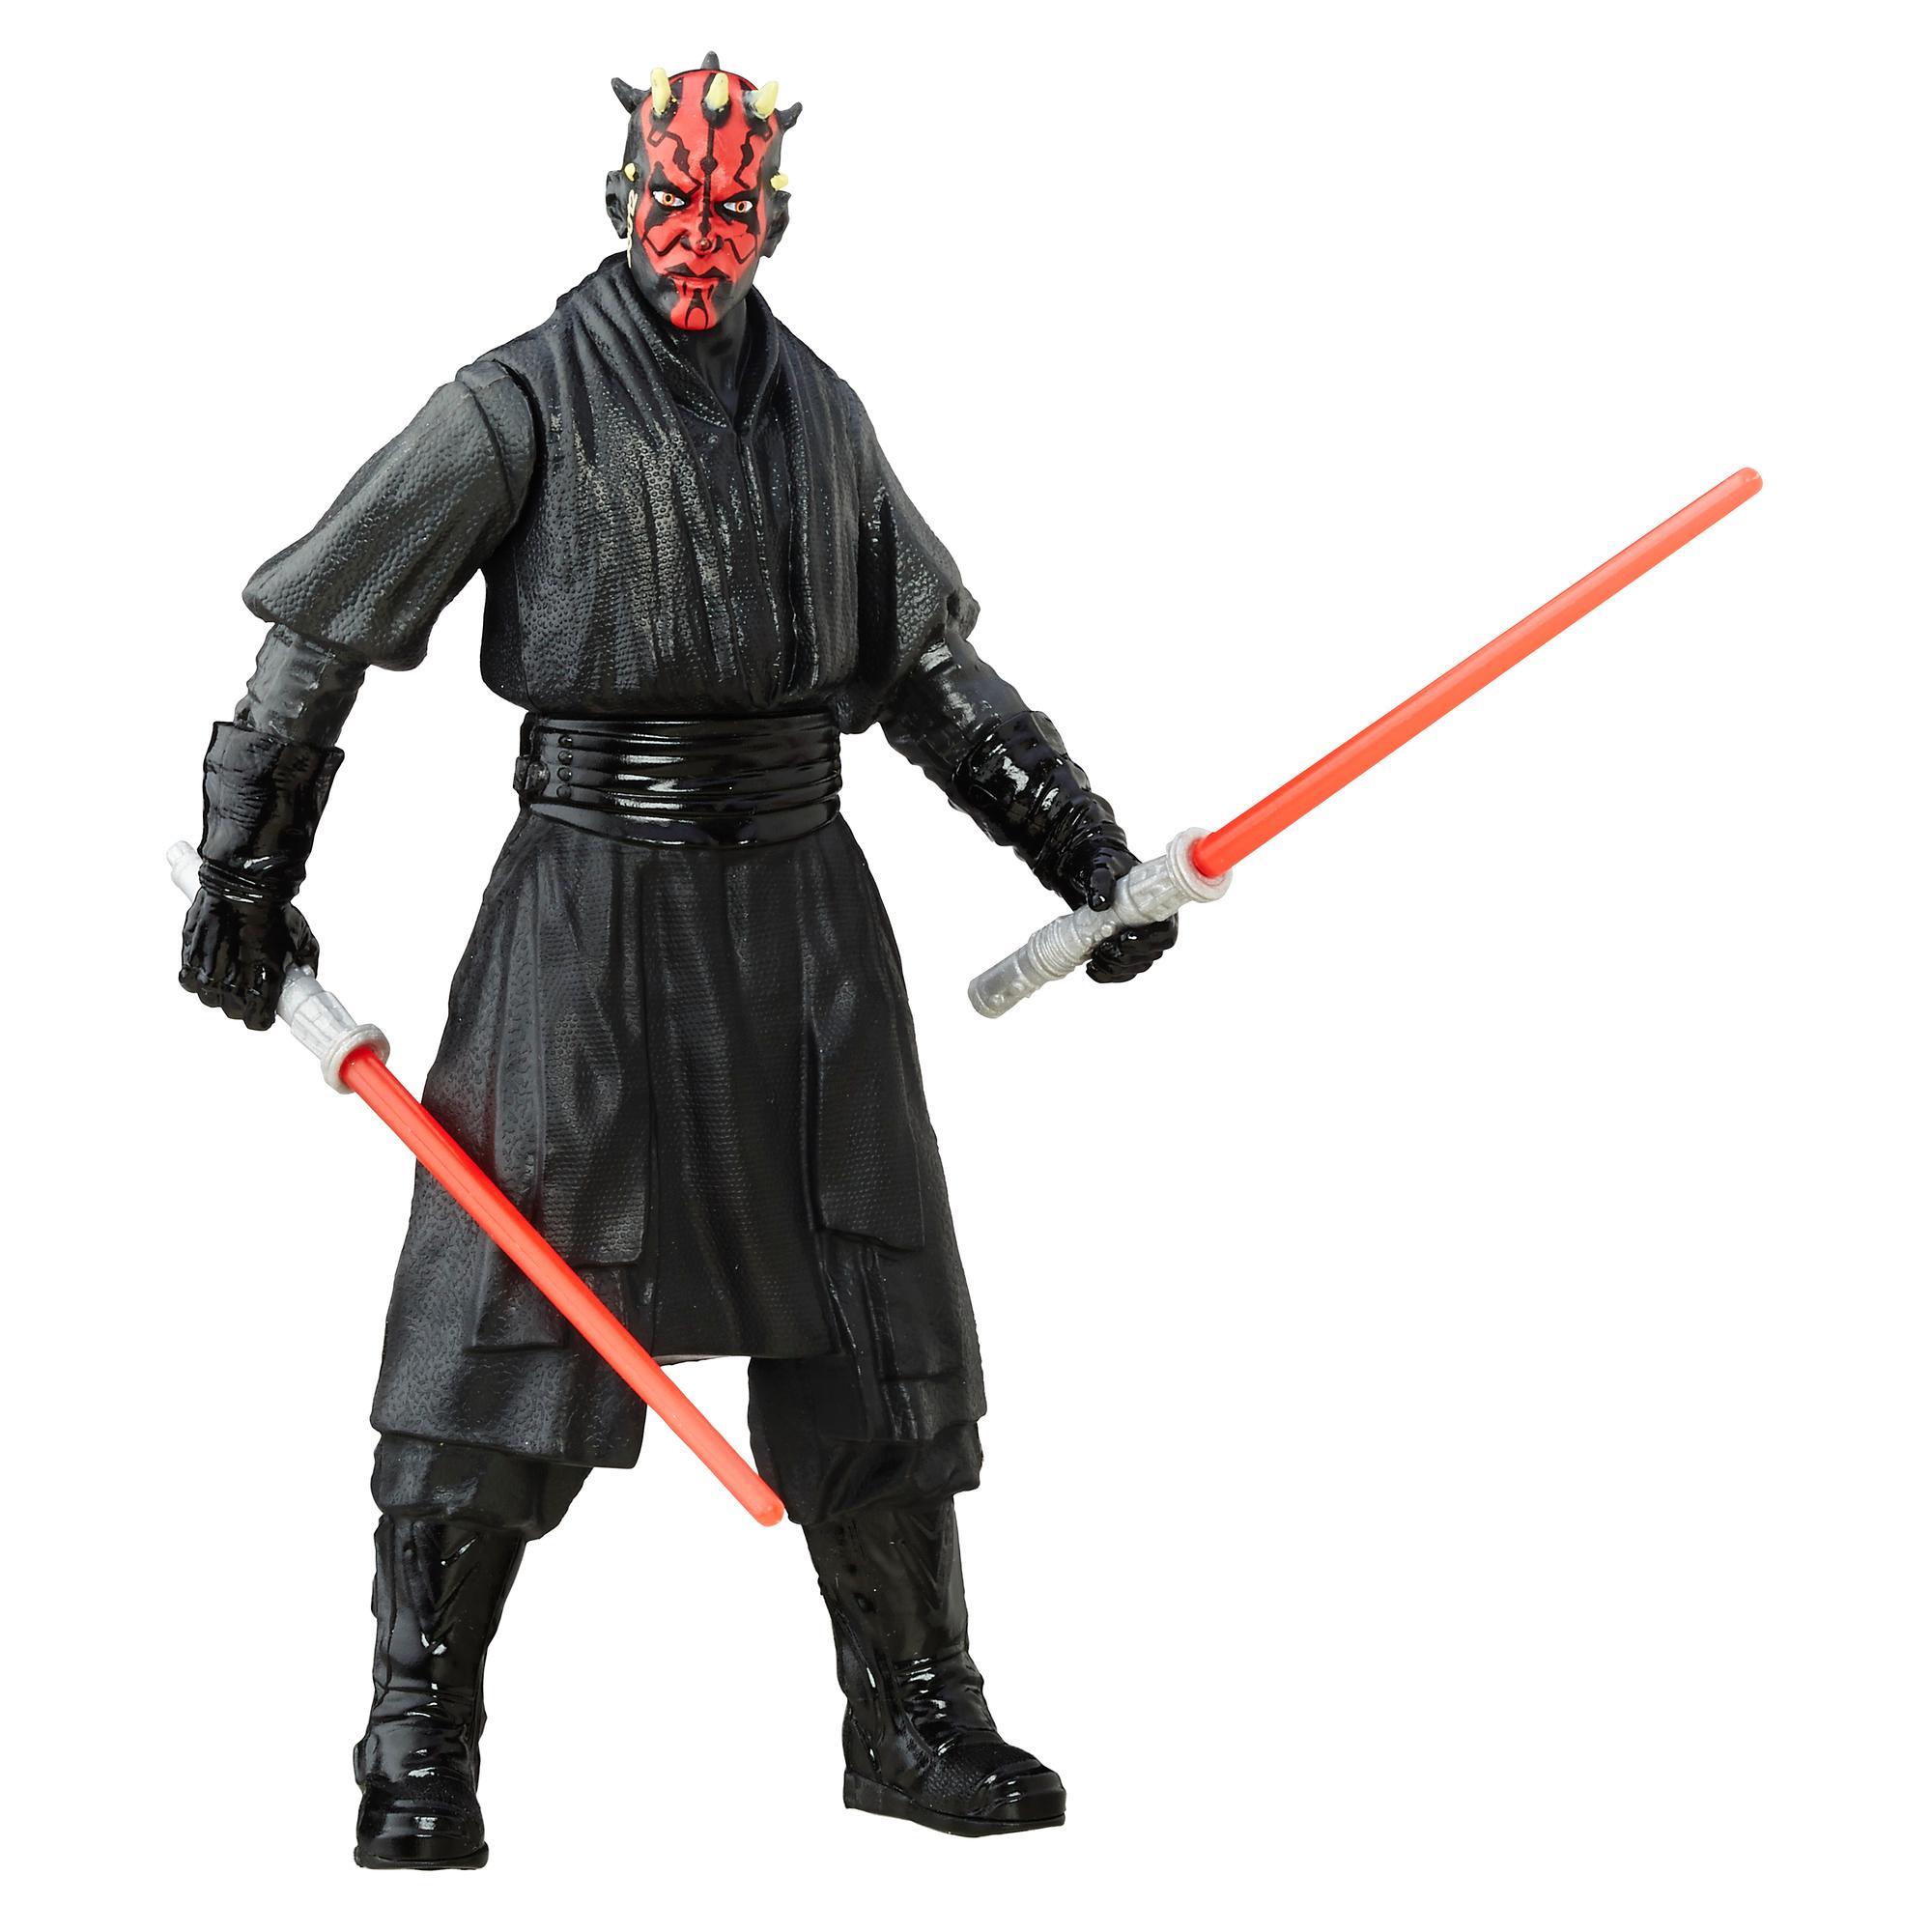 Star Wars Episode I 6-in Darth Maul Figure